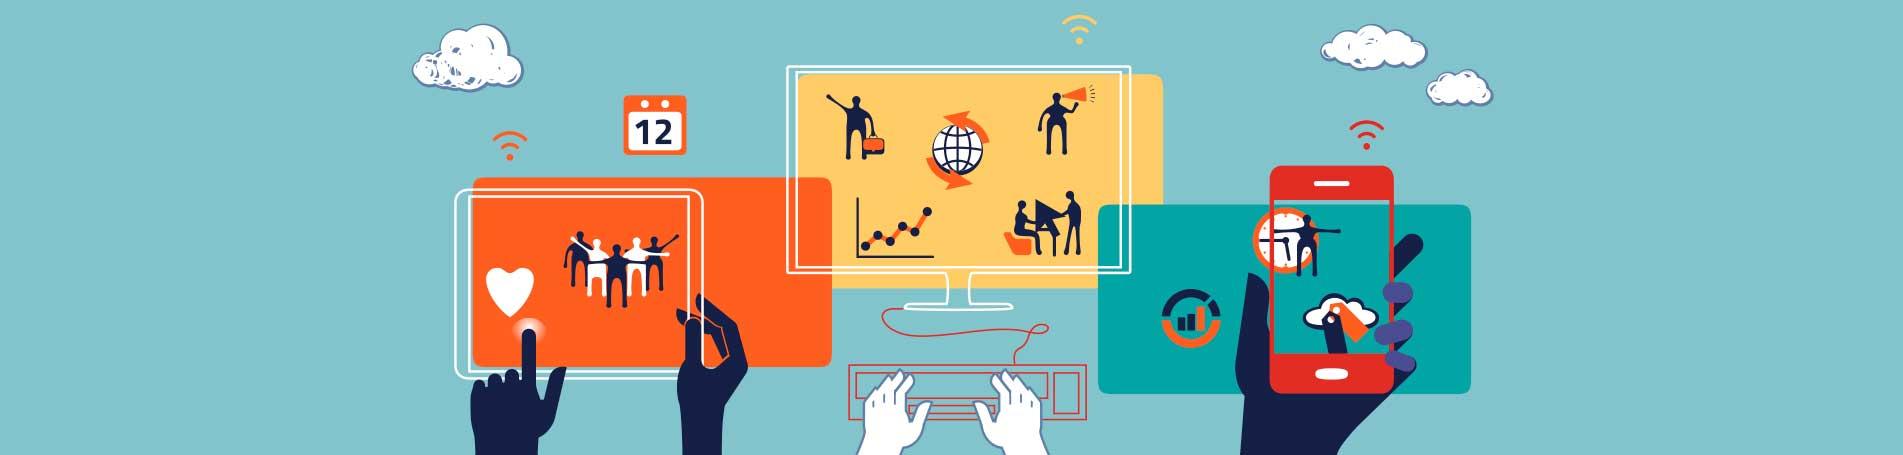 D veloppement digital lifting group - Cabinet conseil strategie digitale ...